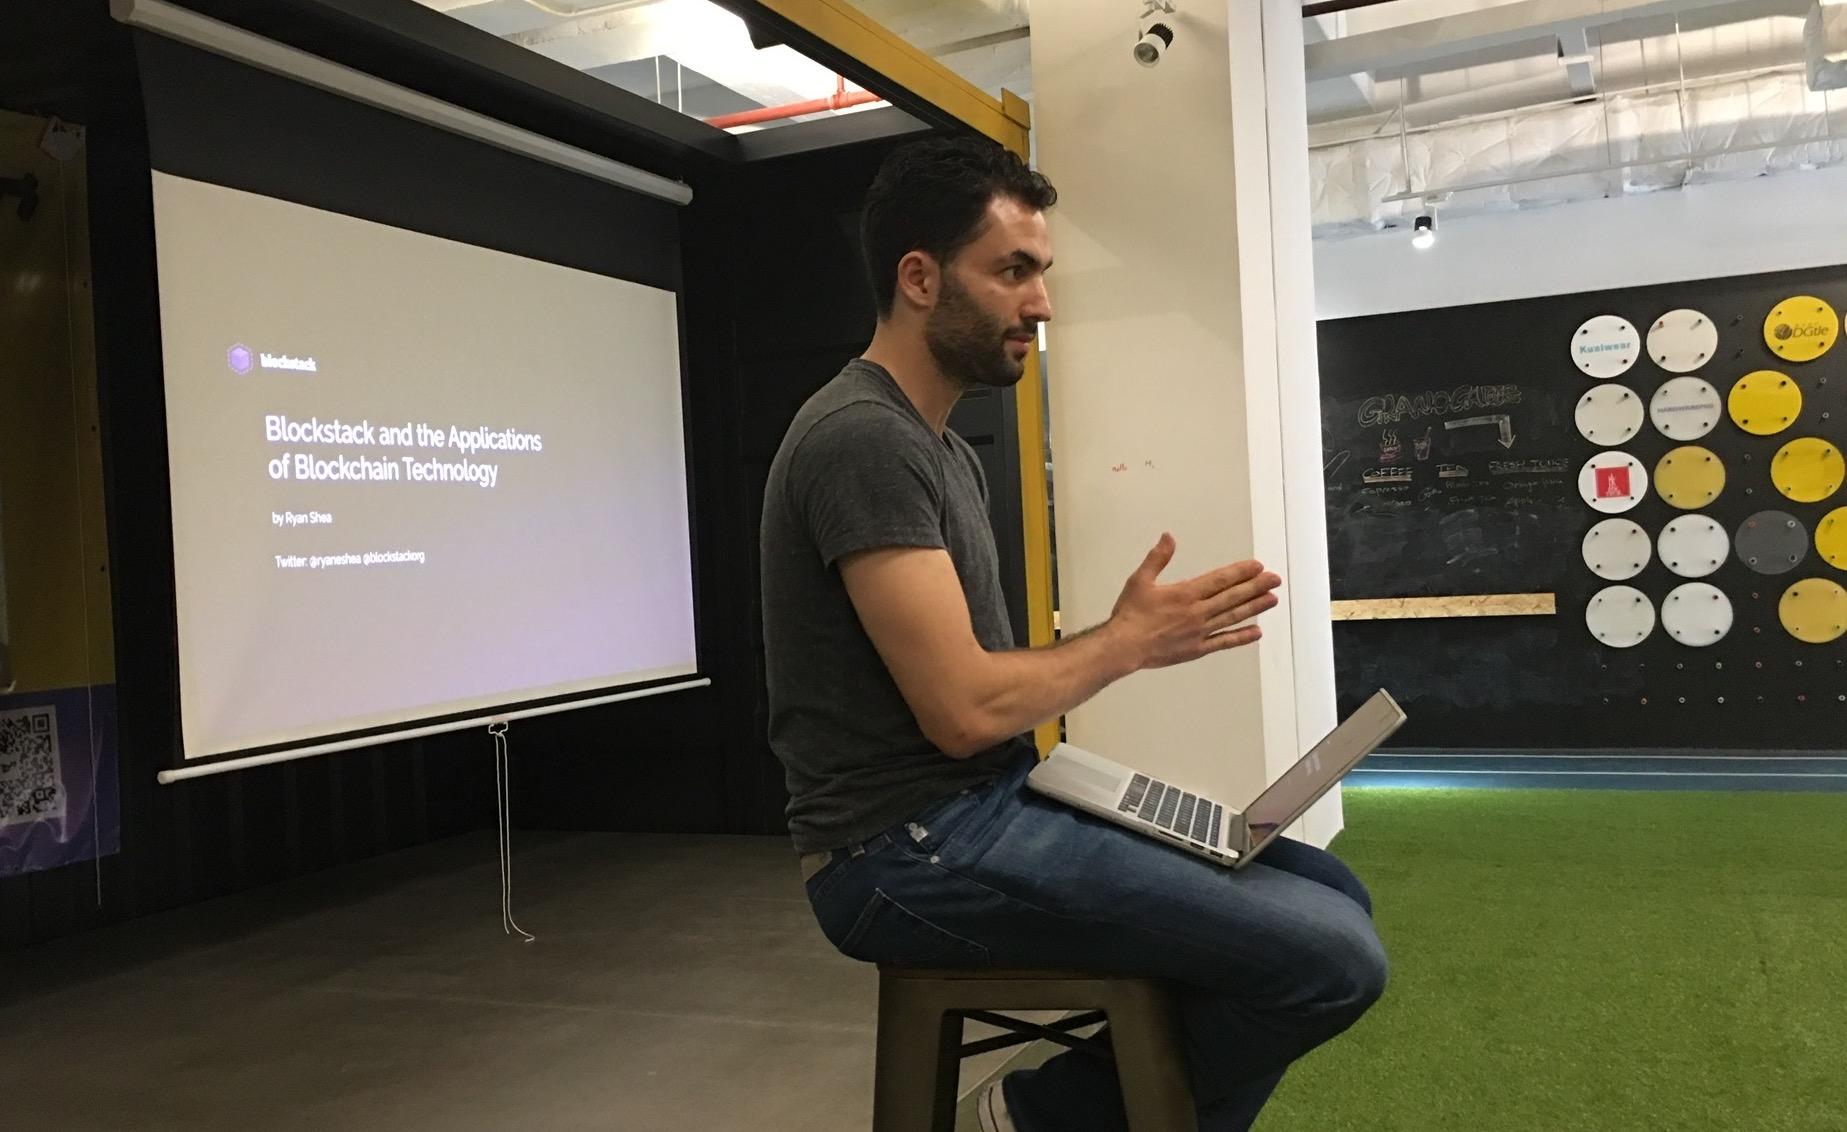 Ryan Shea delivering his intro to Blockstack talk